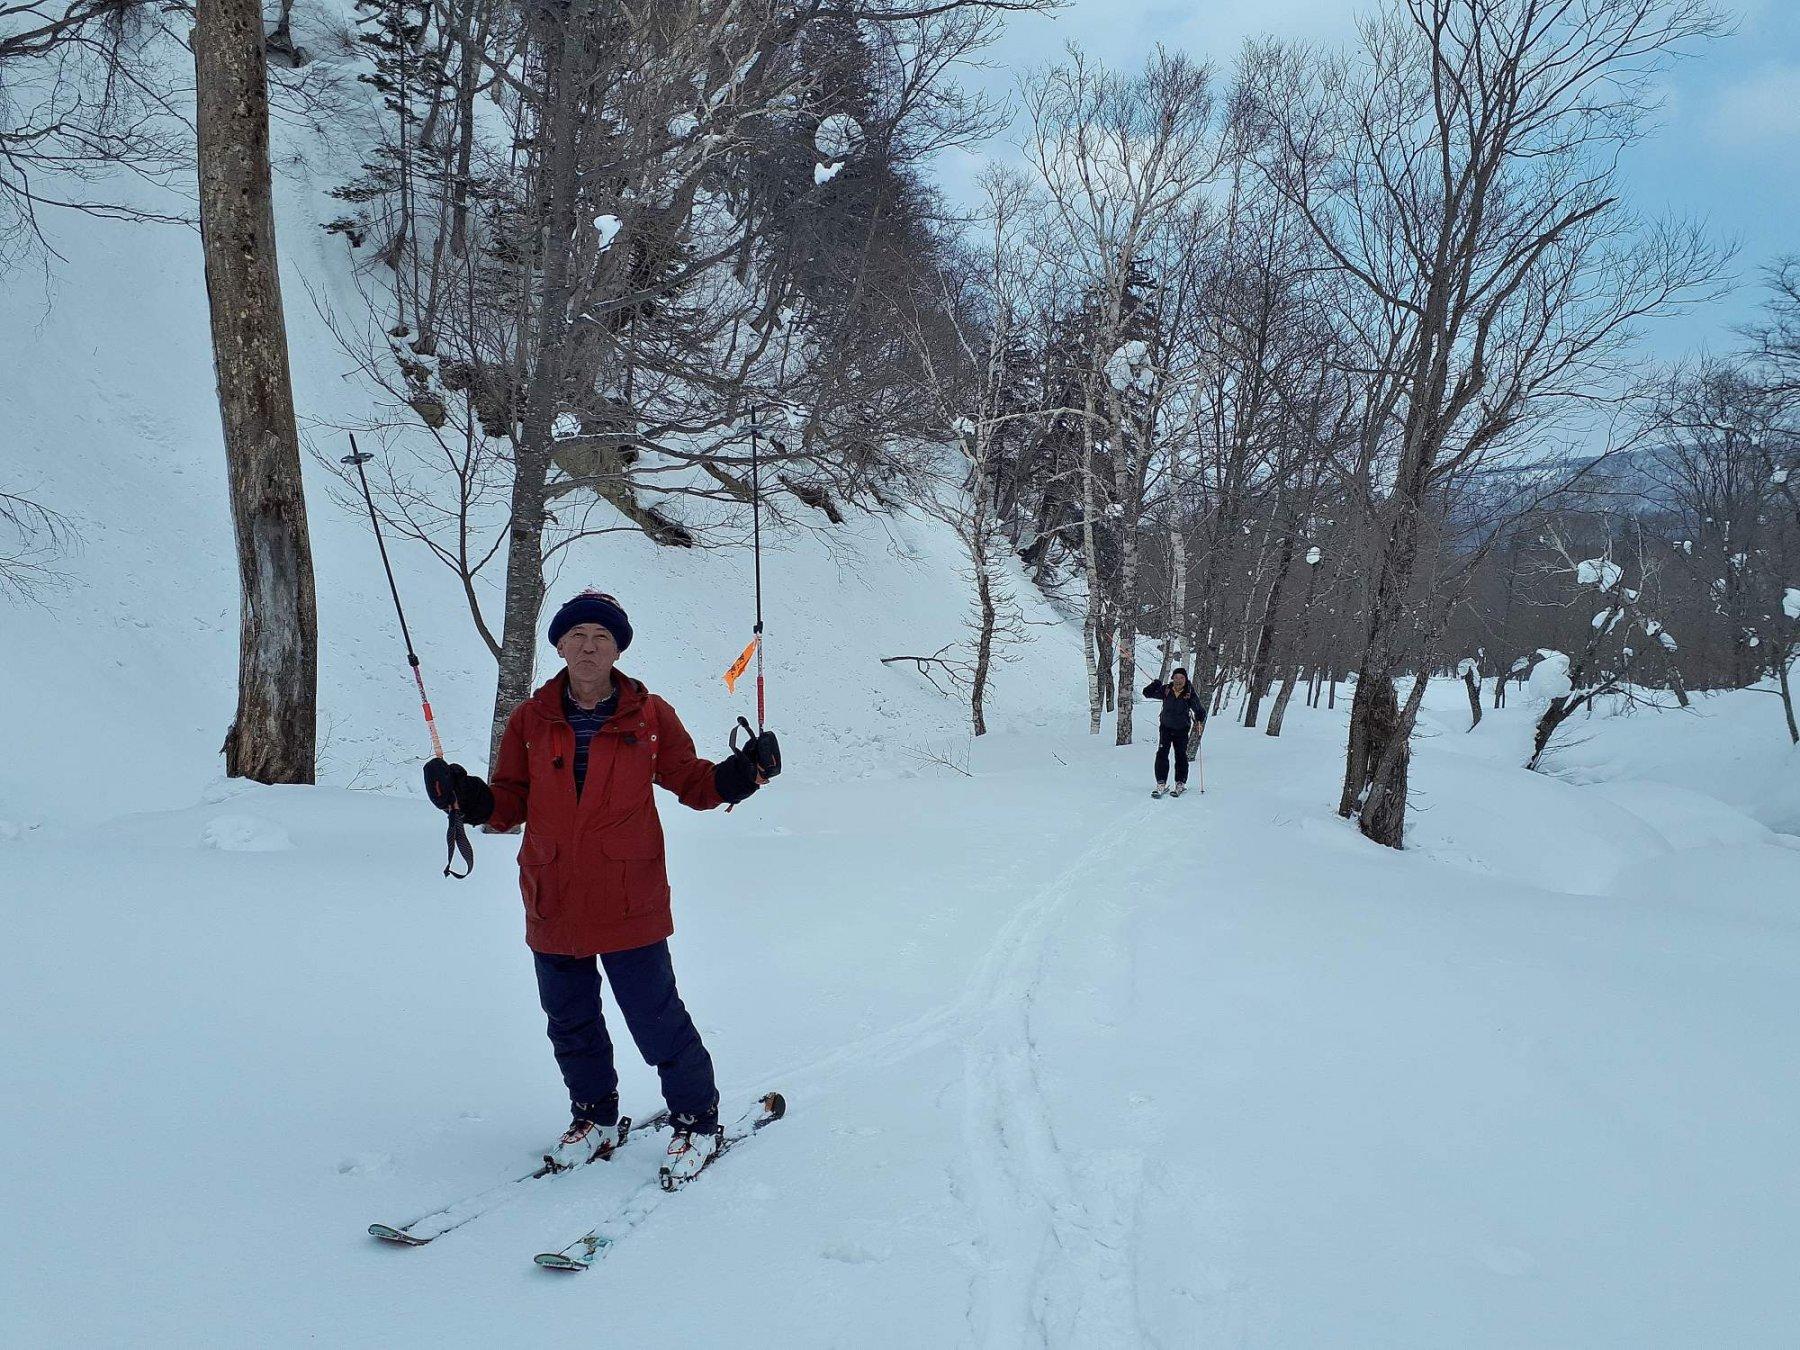 Yoichi (Mount) Kiroro 2019-03-02